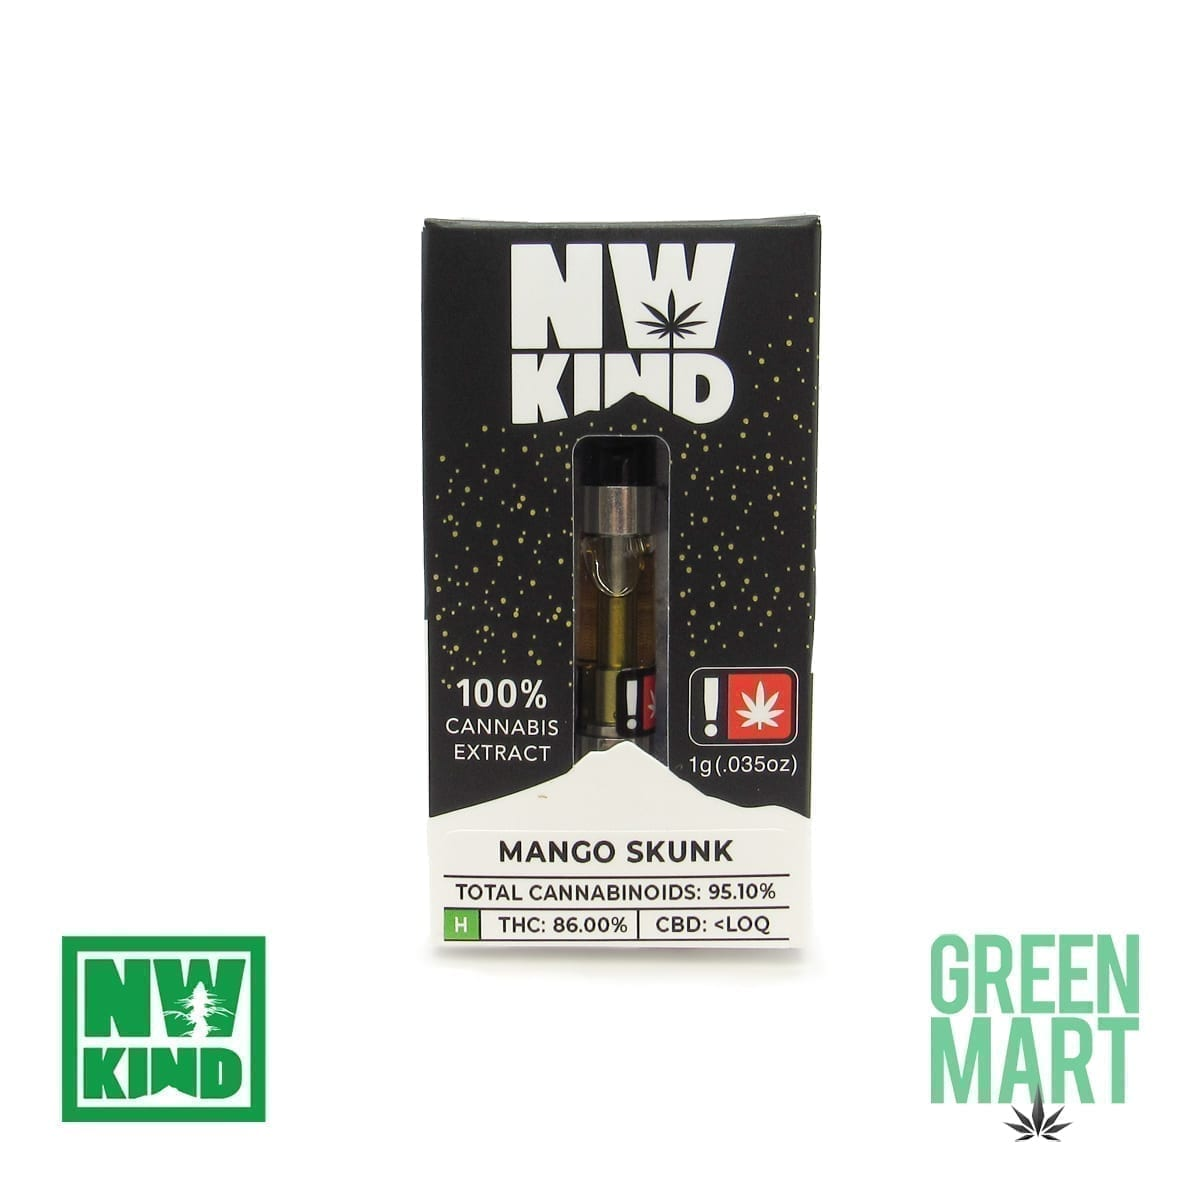 NW Kind Distillate Cartridge - Mango Skunk